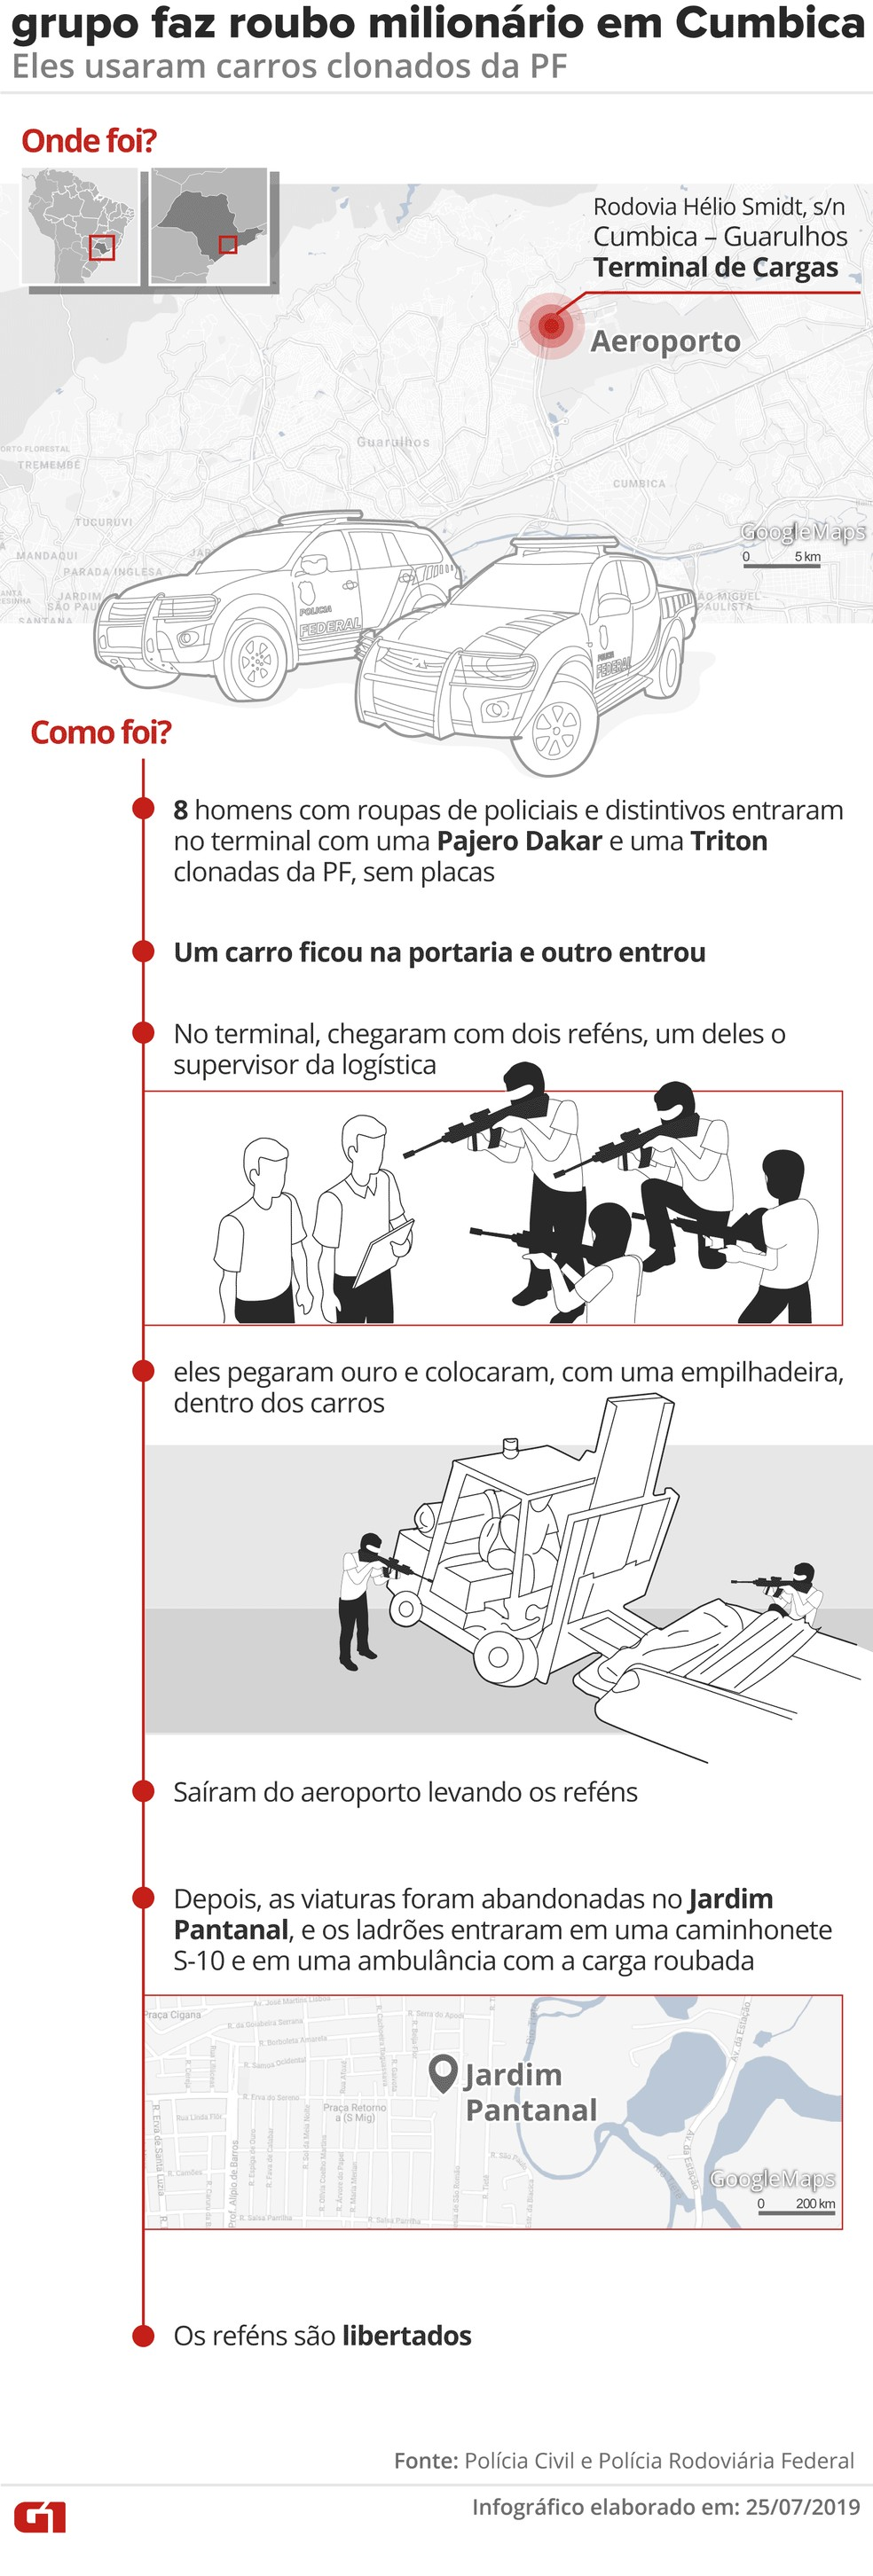 Grupo fortemente armado invade terminal de cargas de Cumbica, faz reféns e rouba ouro — Foto: Arte/G1